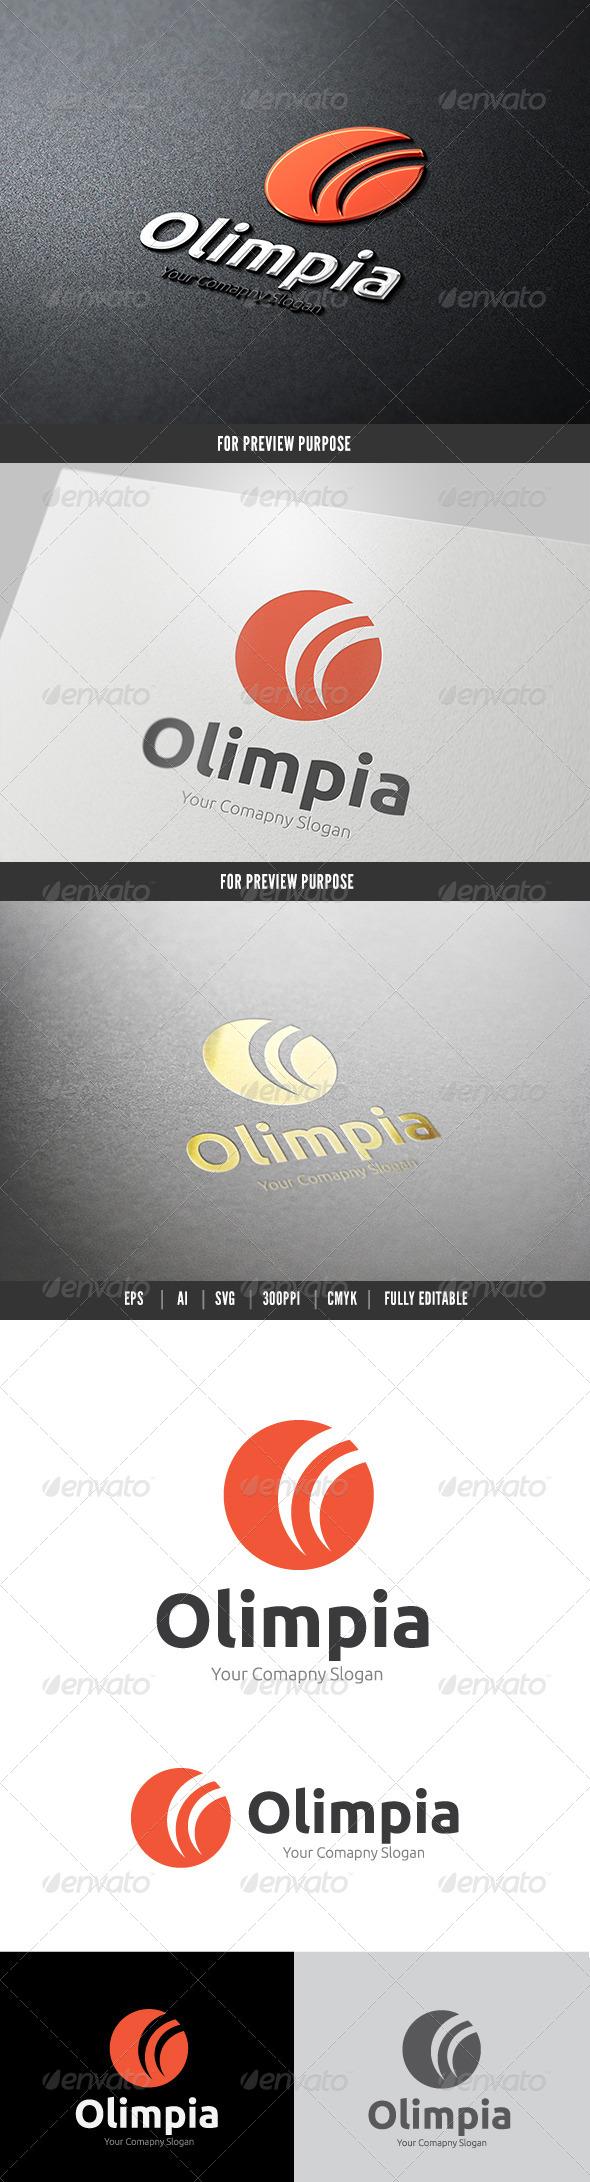 GraphicRiver Olympia Logo 6464043